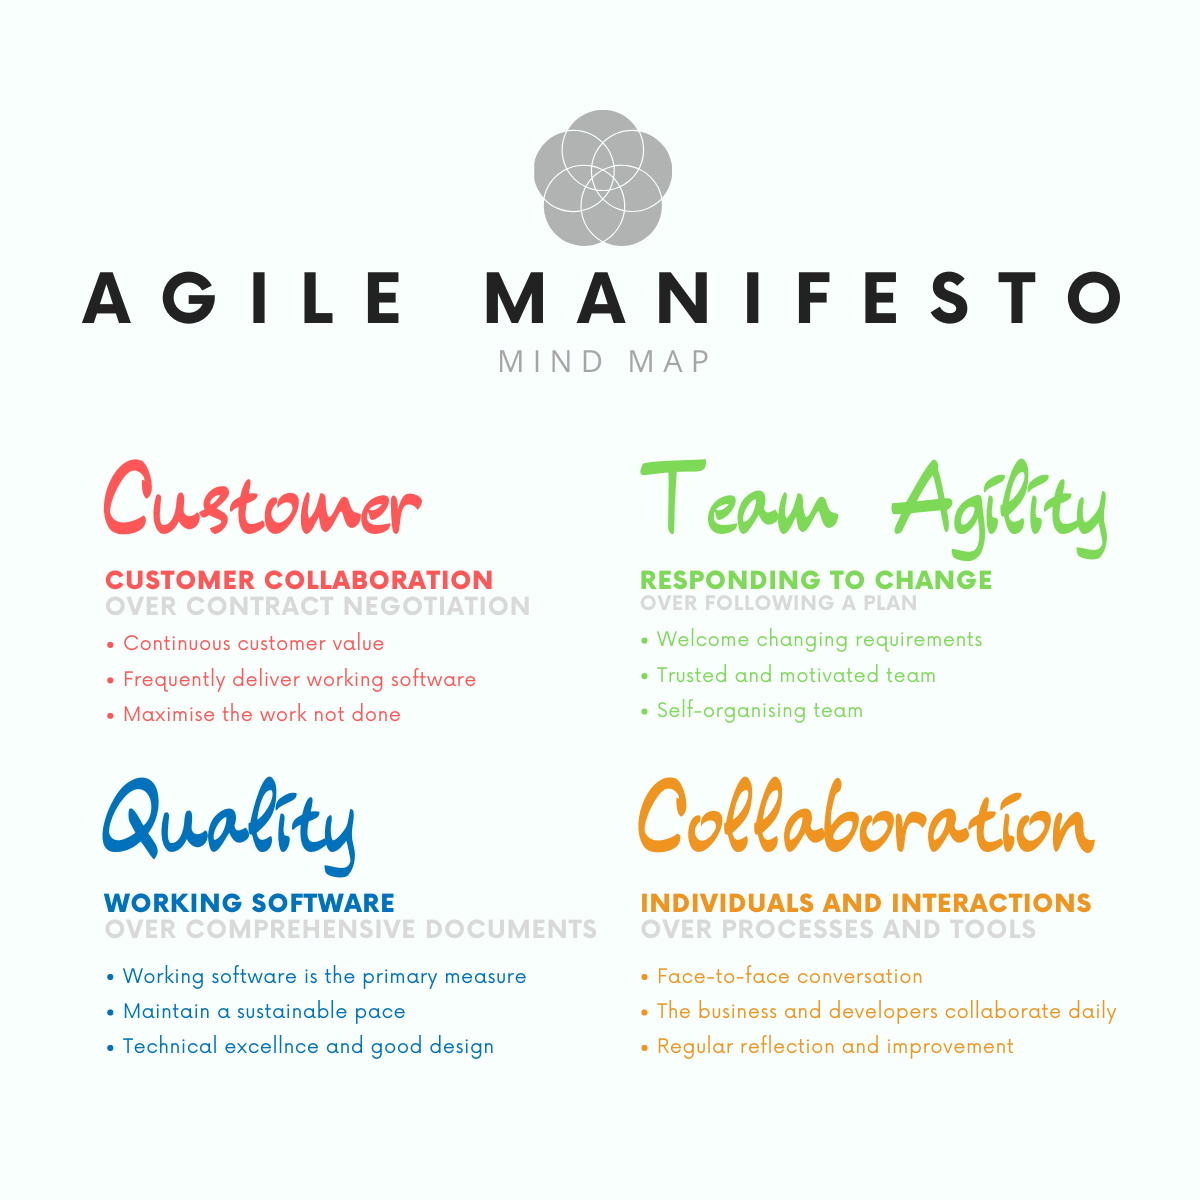 Agile Manifesto Mind Map highlighting customer, team agility, quality, and collaboration